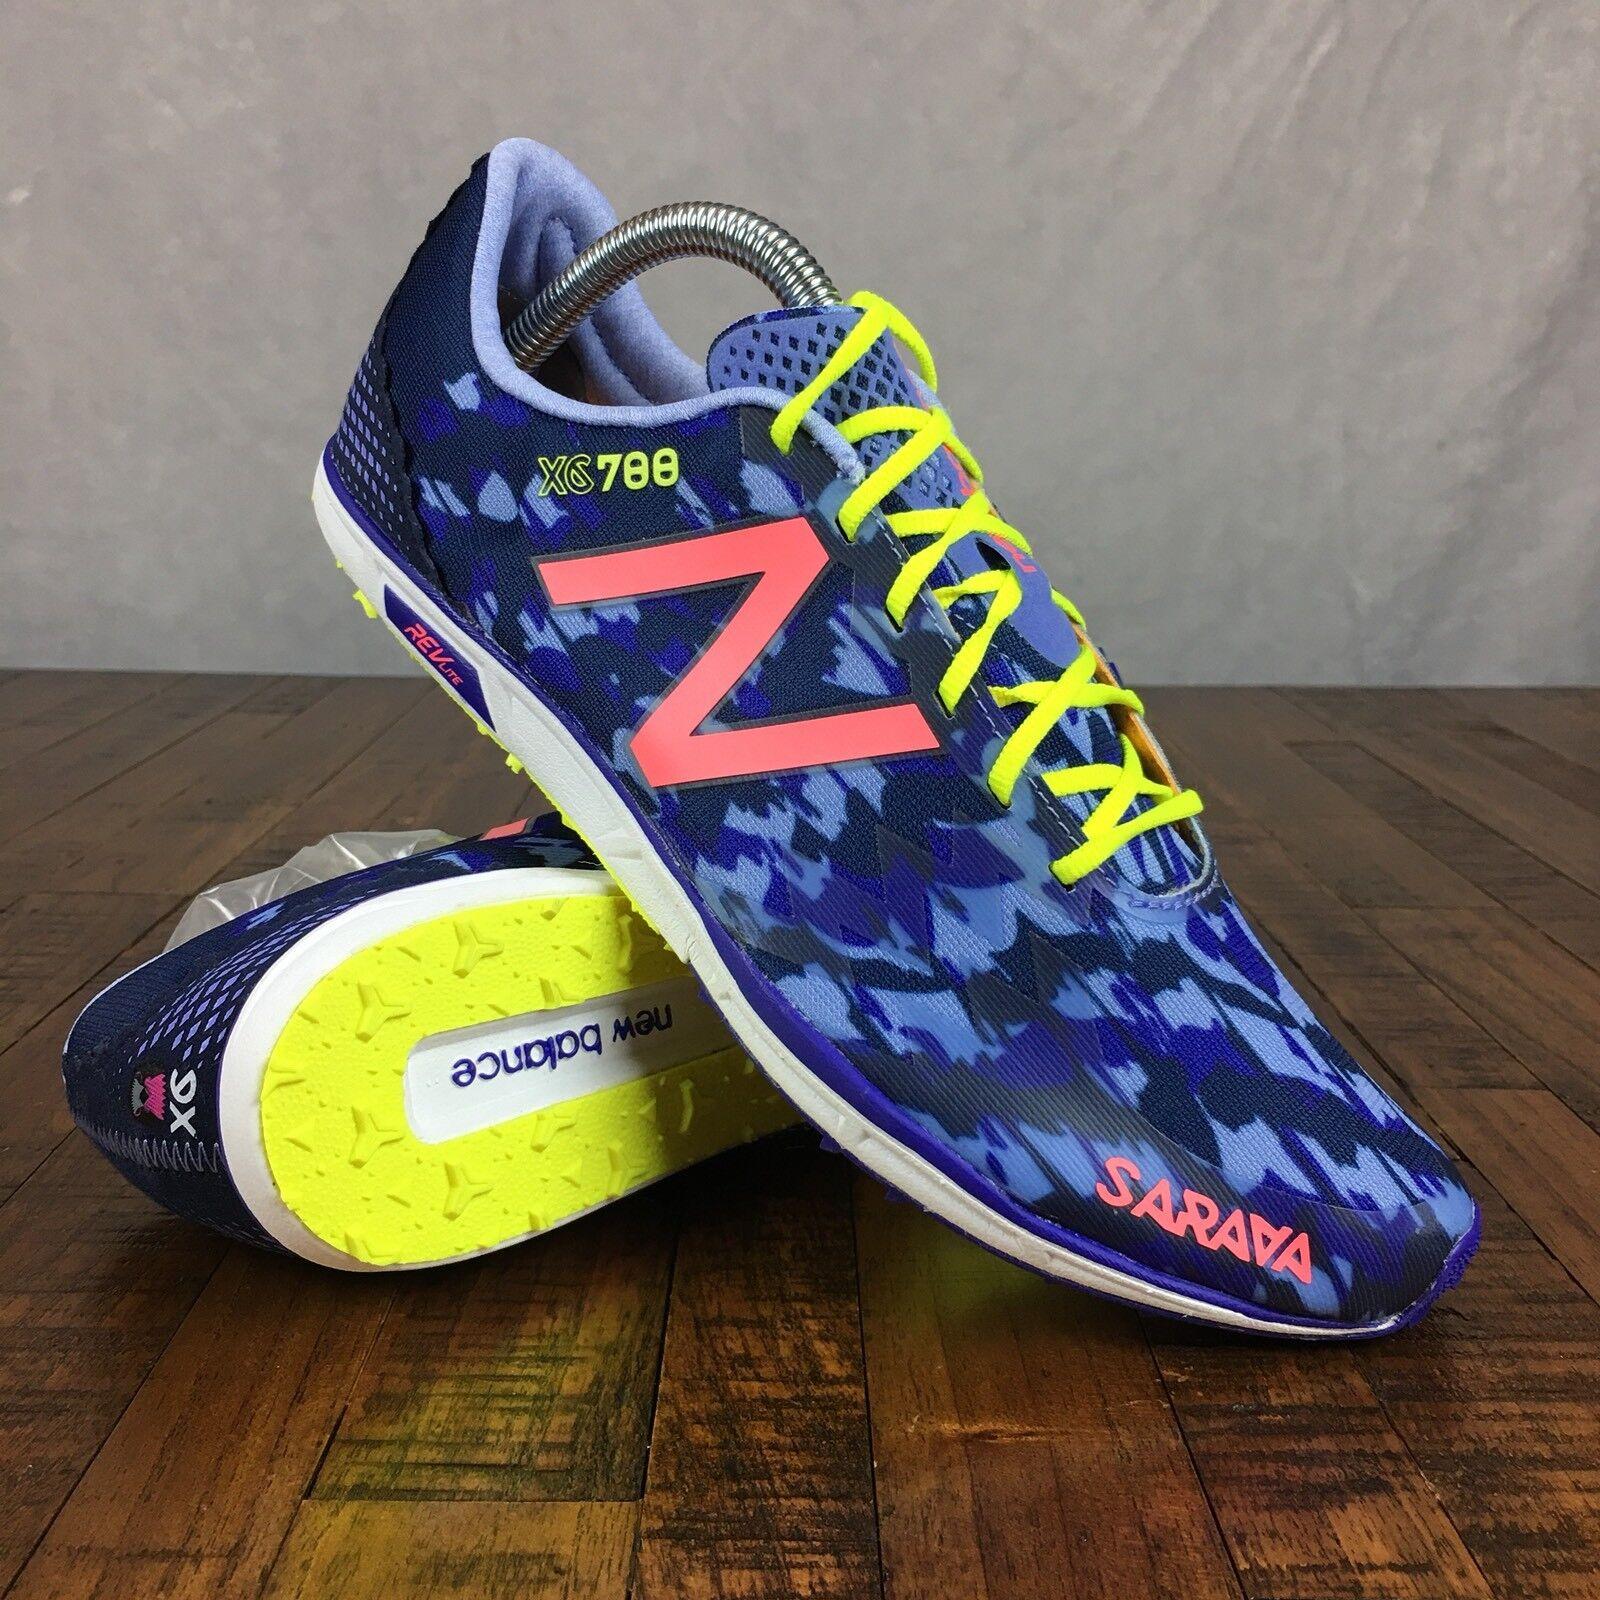 New Balance XC700 v5 Track Shoes Spikes Key Purple WXCS700G Womens Size 9.5